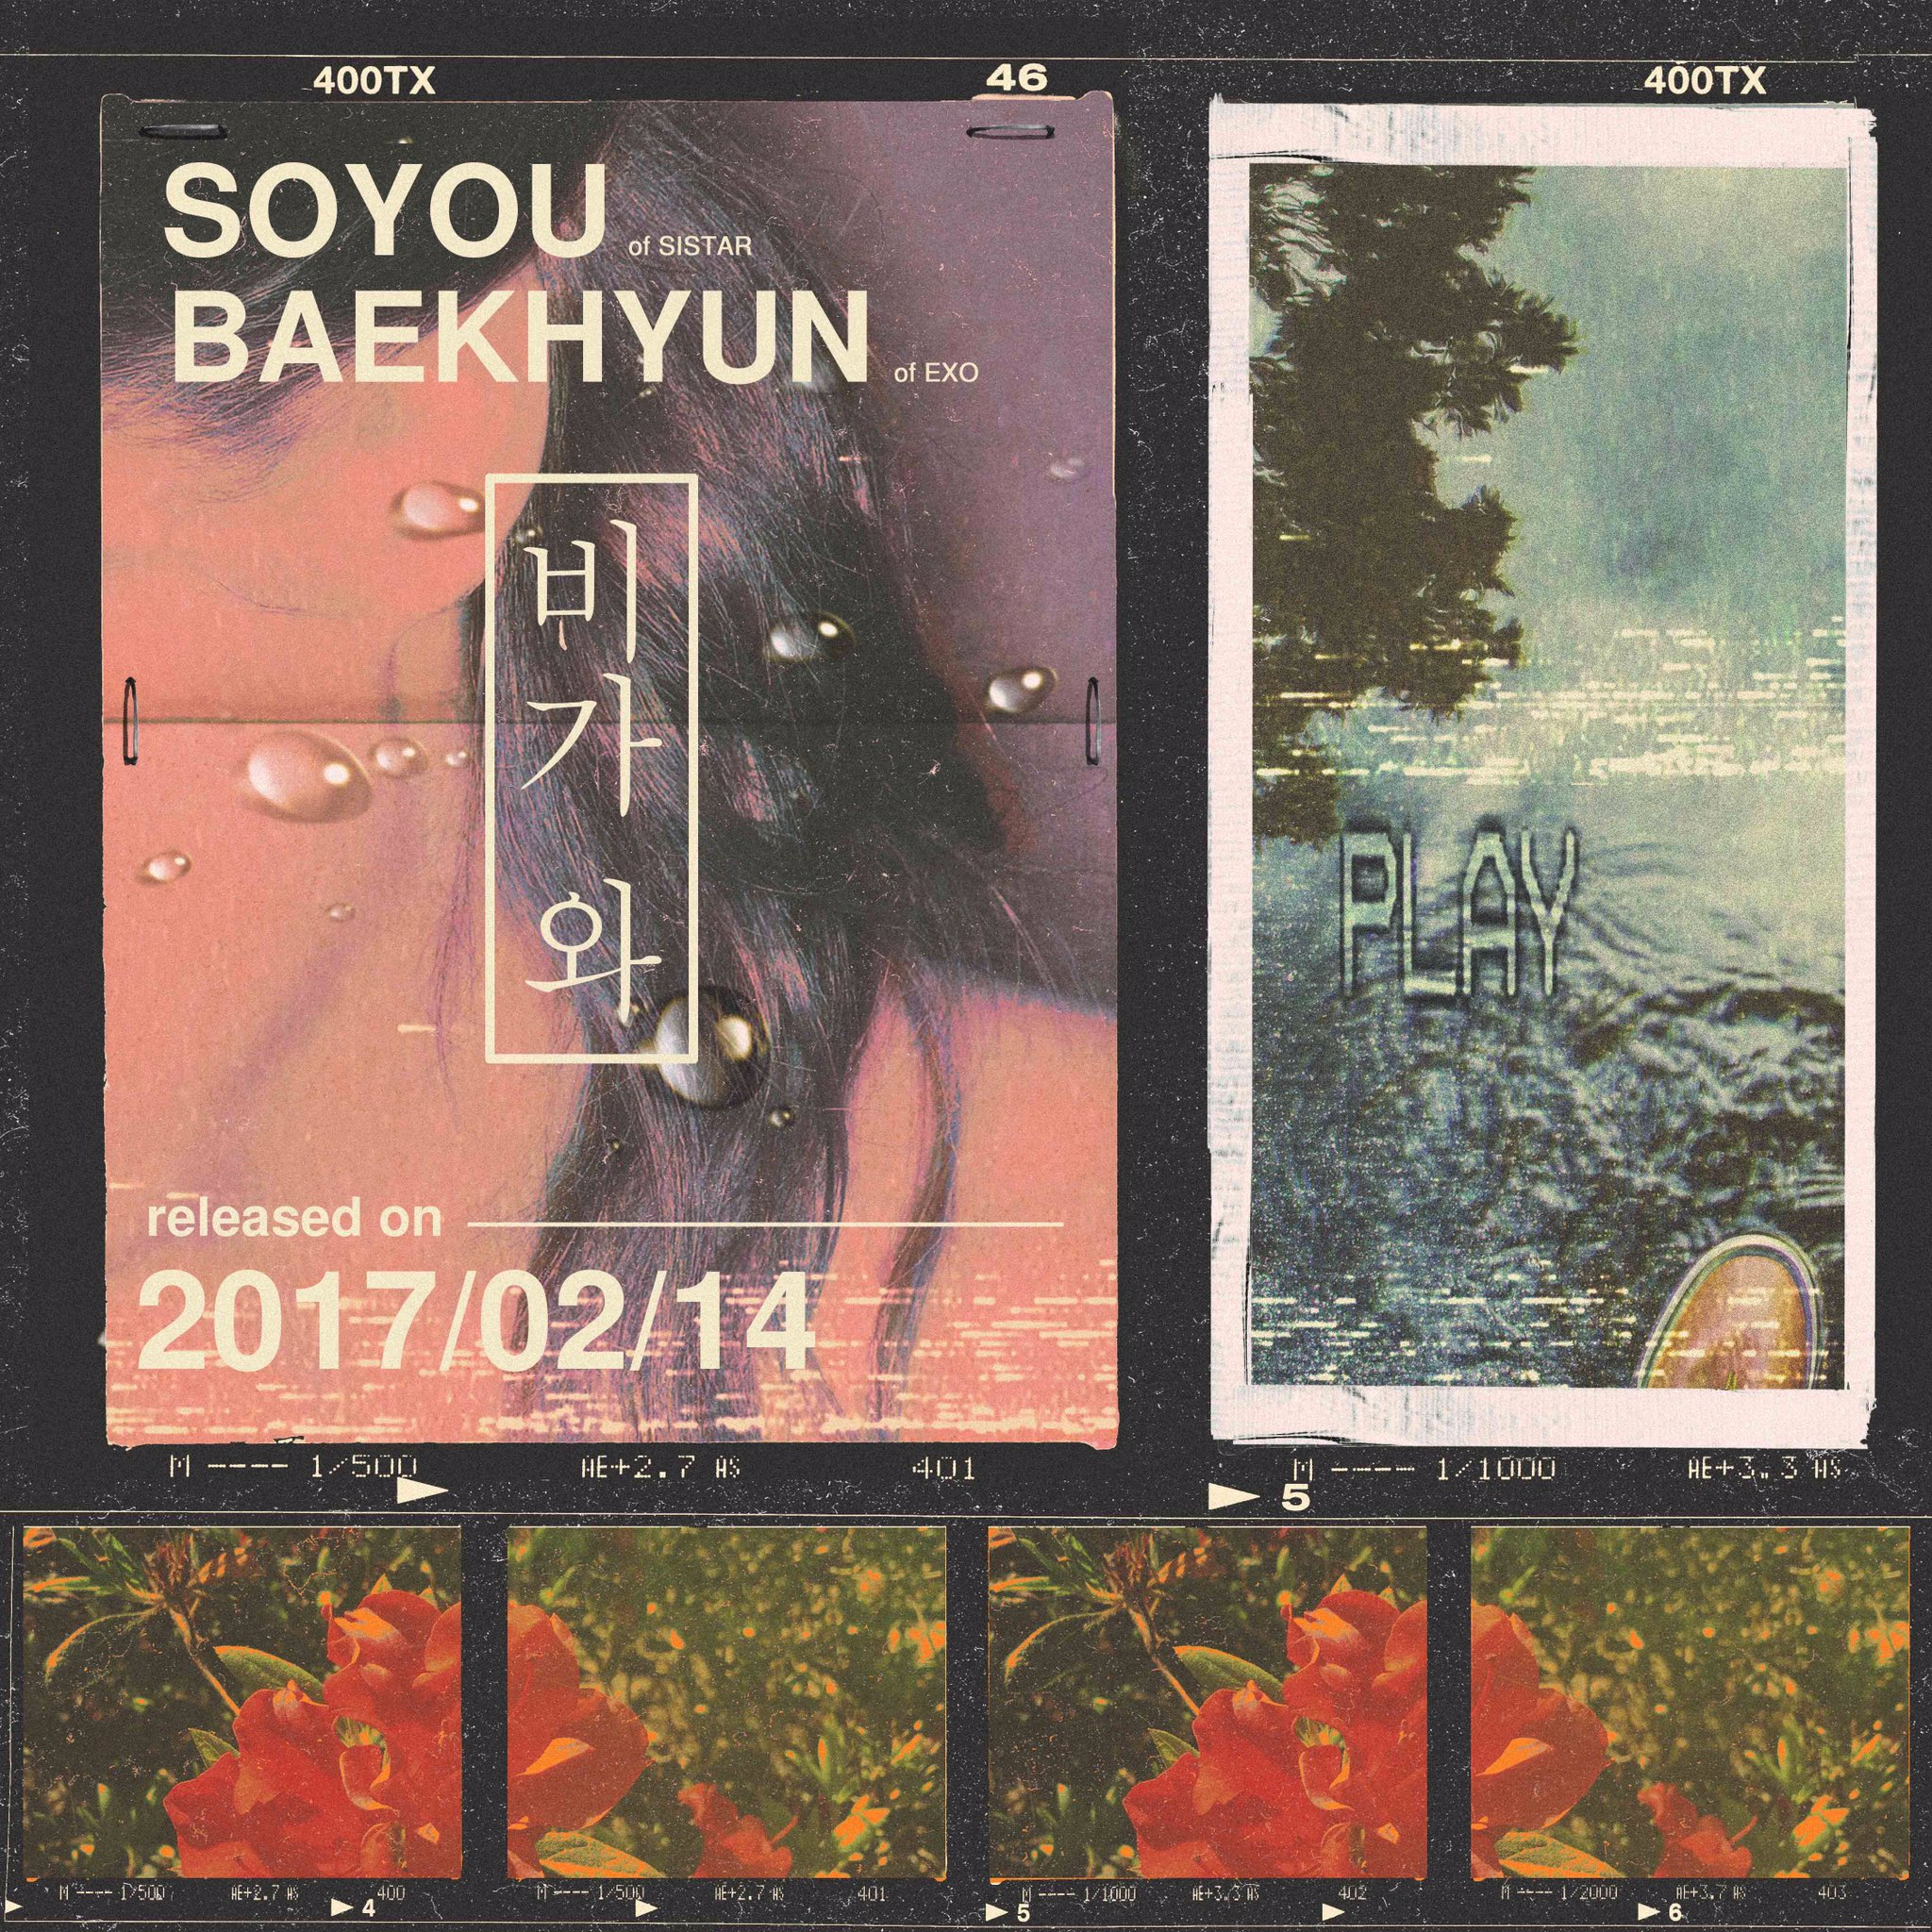 soyou baekhyun